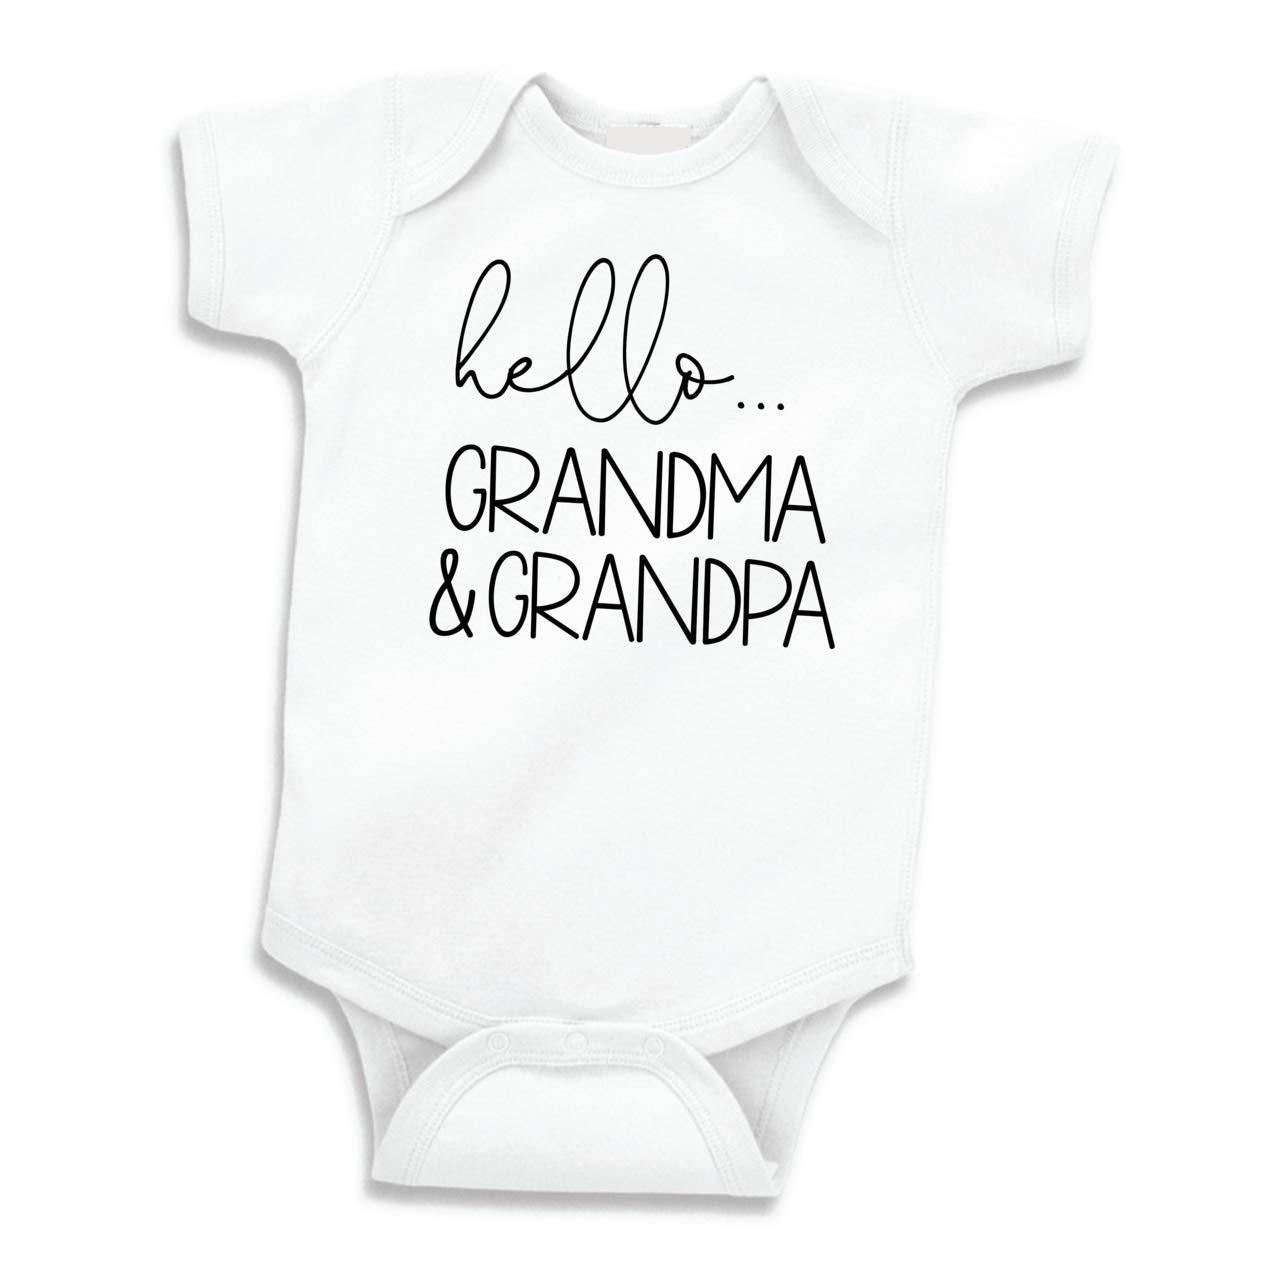 f0bec053c3735 Amazon.com  Hello Grandma and Grandpa Baby Announcement Gift Grandparents   Clothing